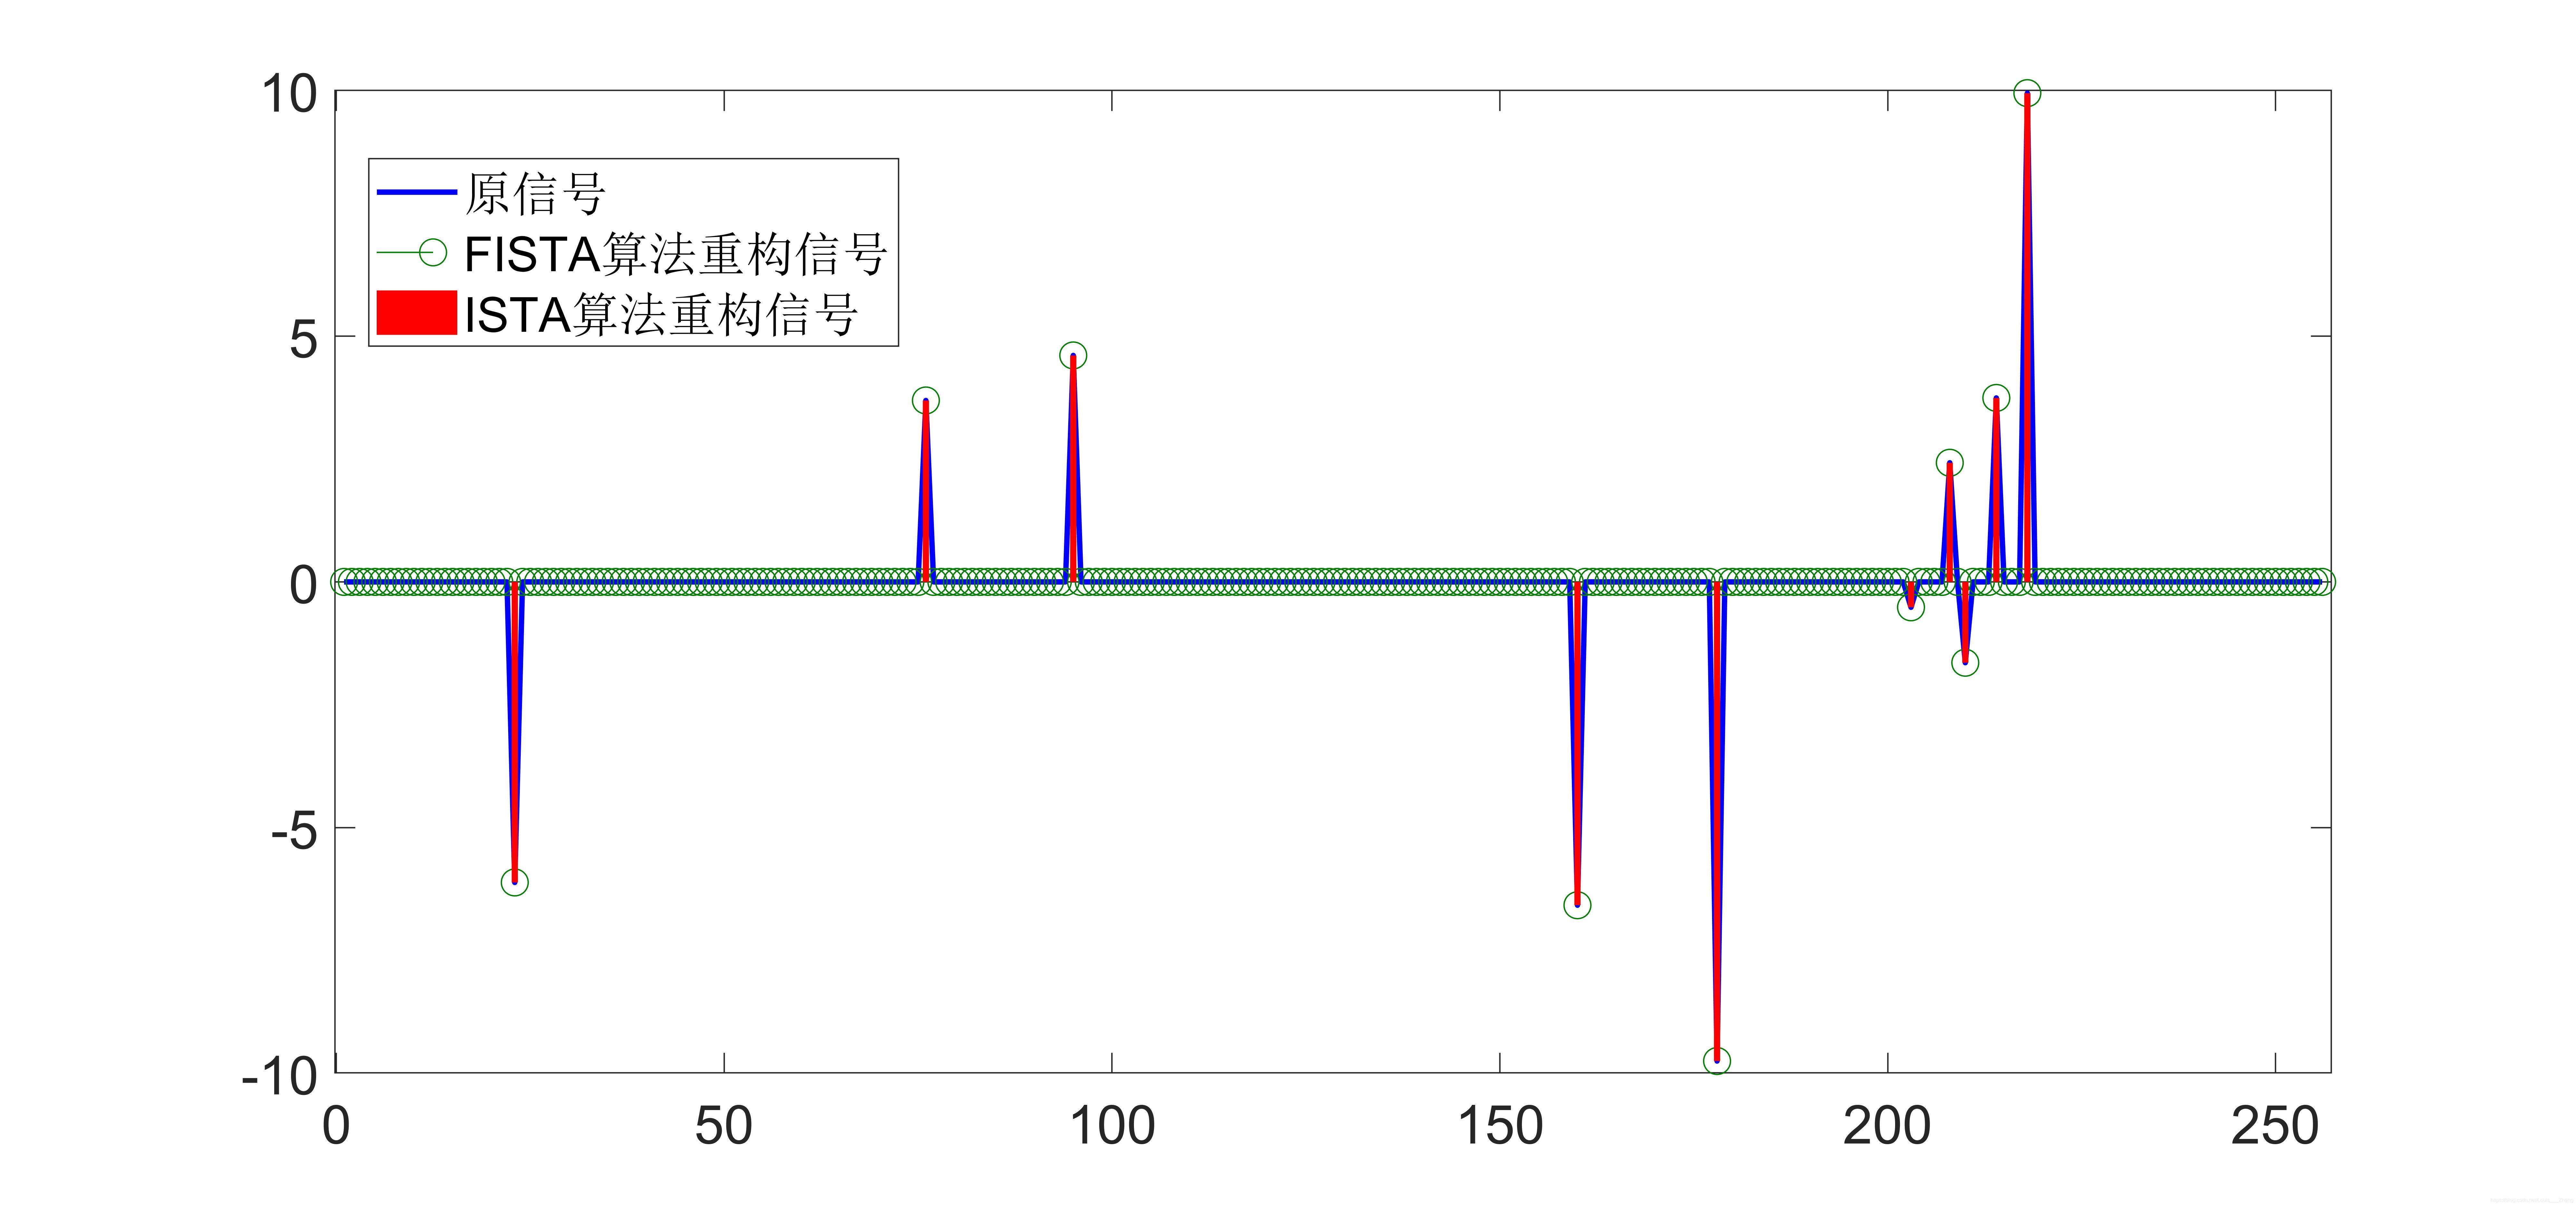 ISTA算法和FISTA算法重构结构